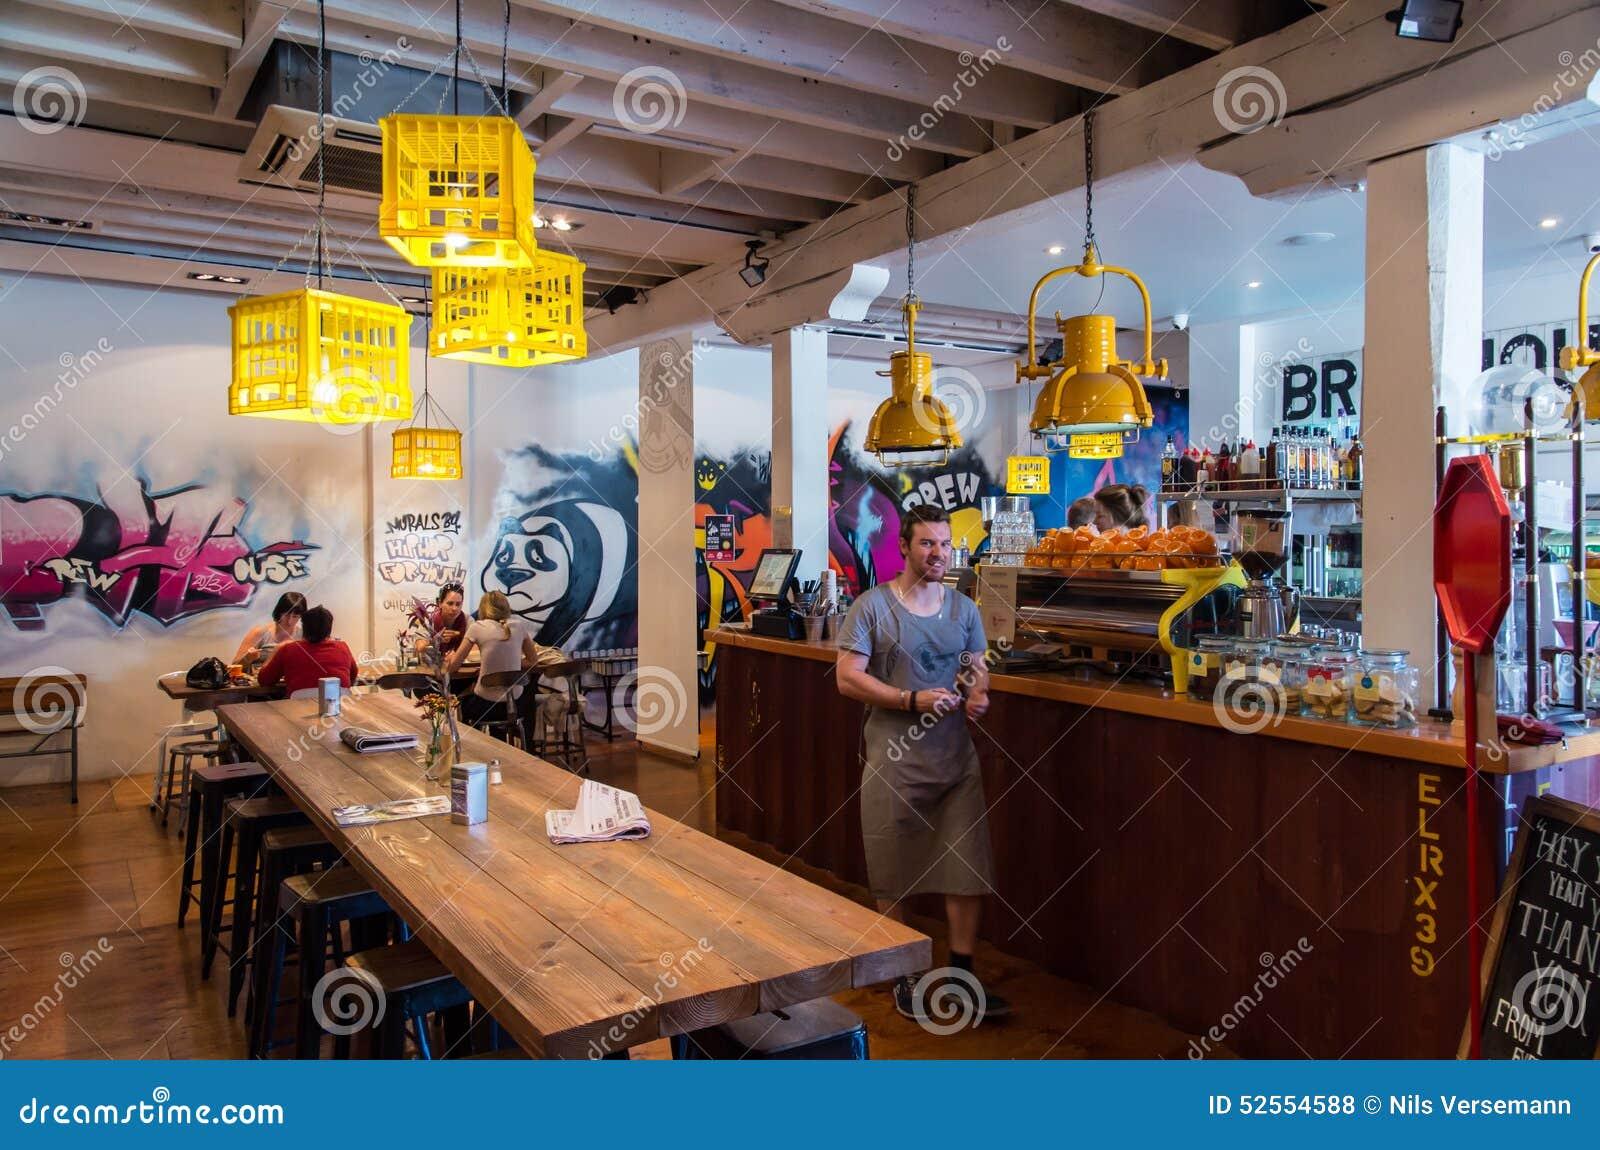 Brew City Coffee House